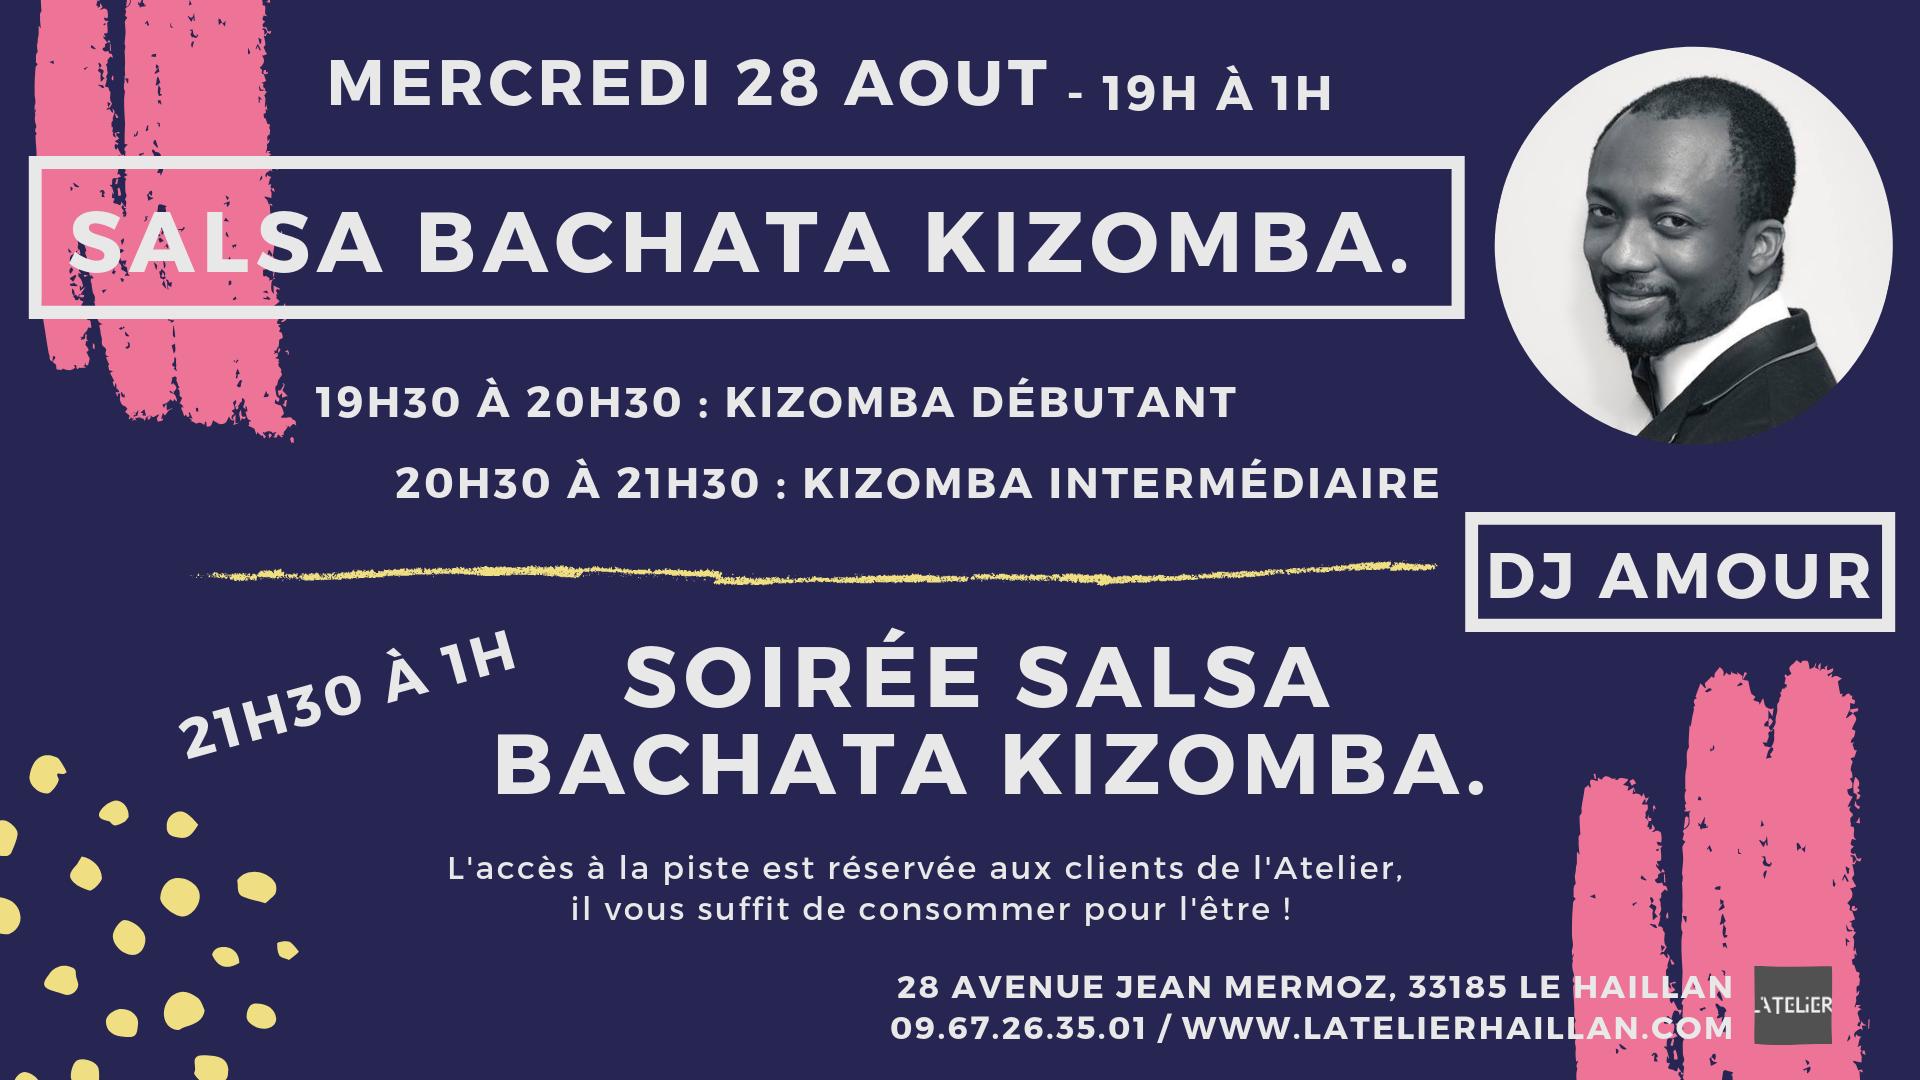 Soirée Salsa, Bachata, Kizomba avec Amour - 2 stages de Kizomba